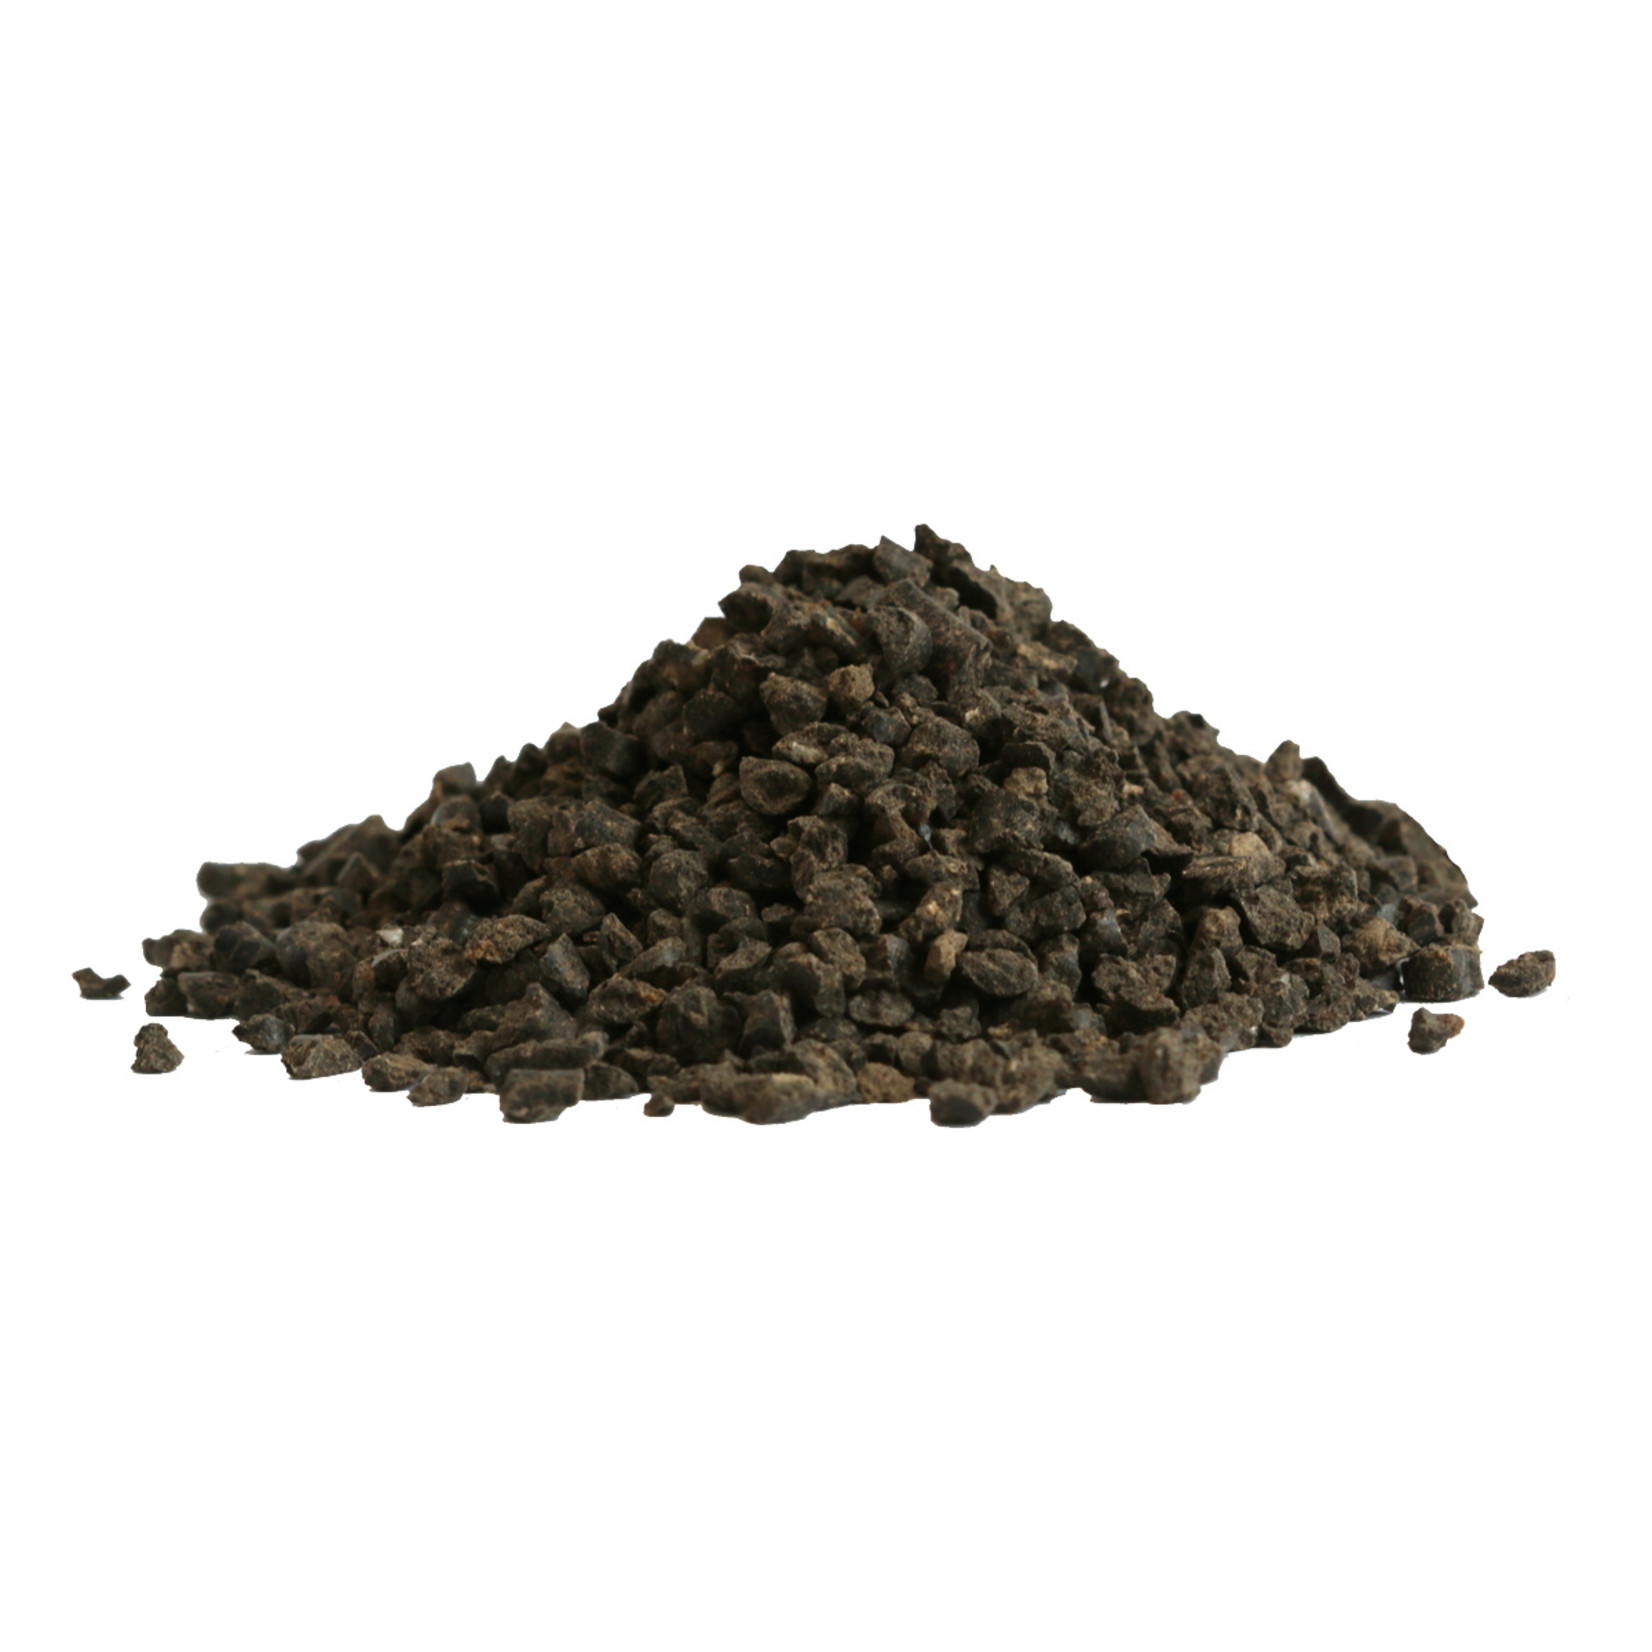 Ecostyle Professioneel Myco-Sedum Meststof Groen en sedumdaken 10 kg